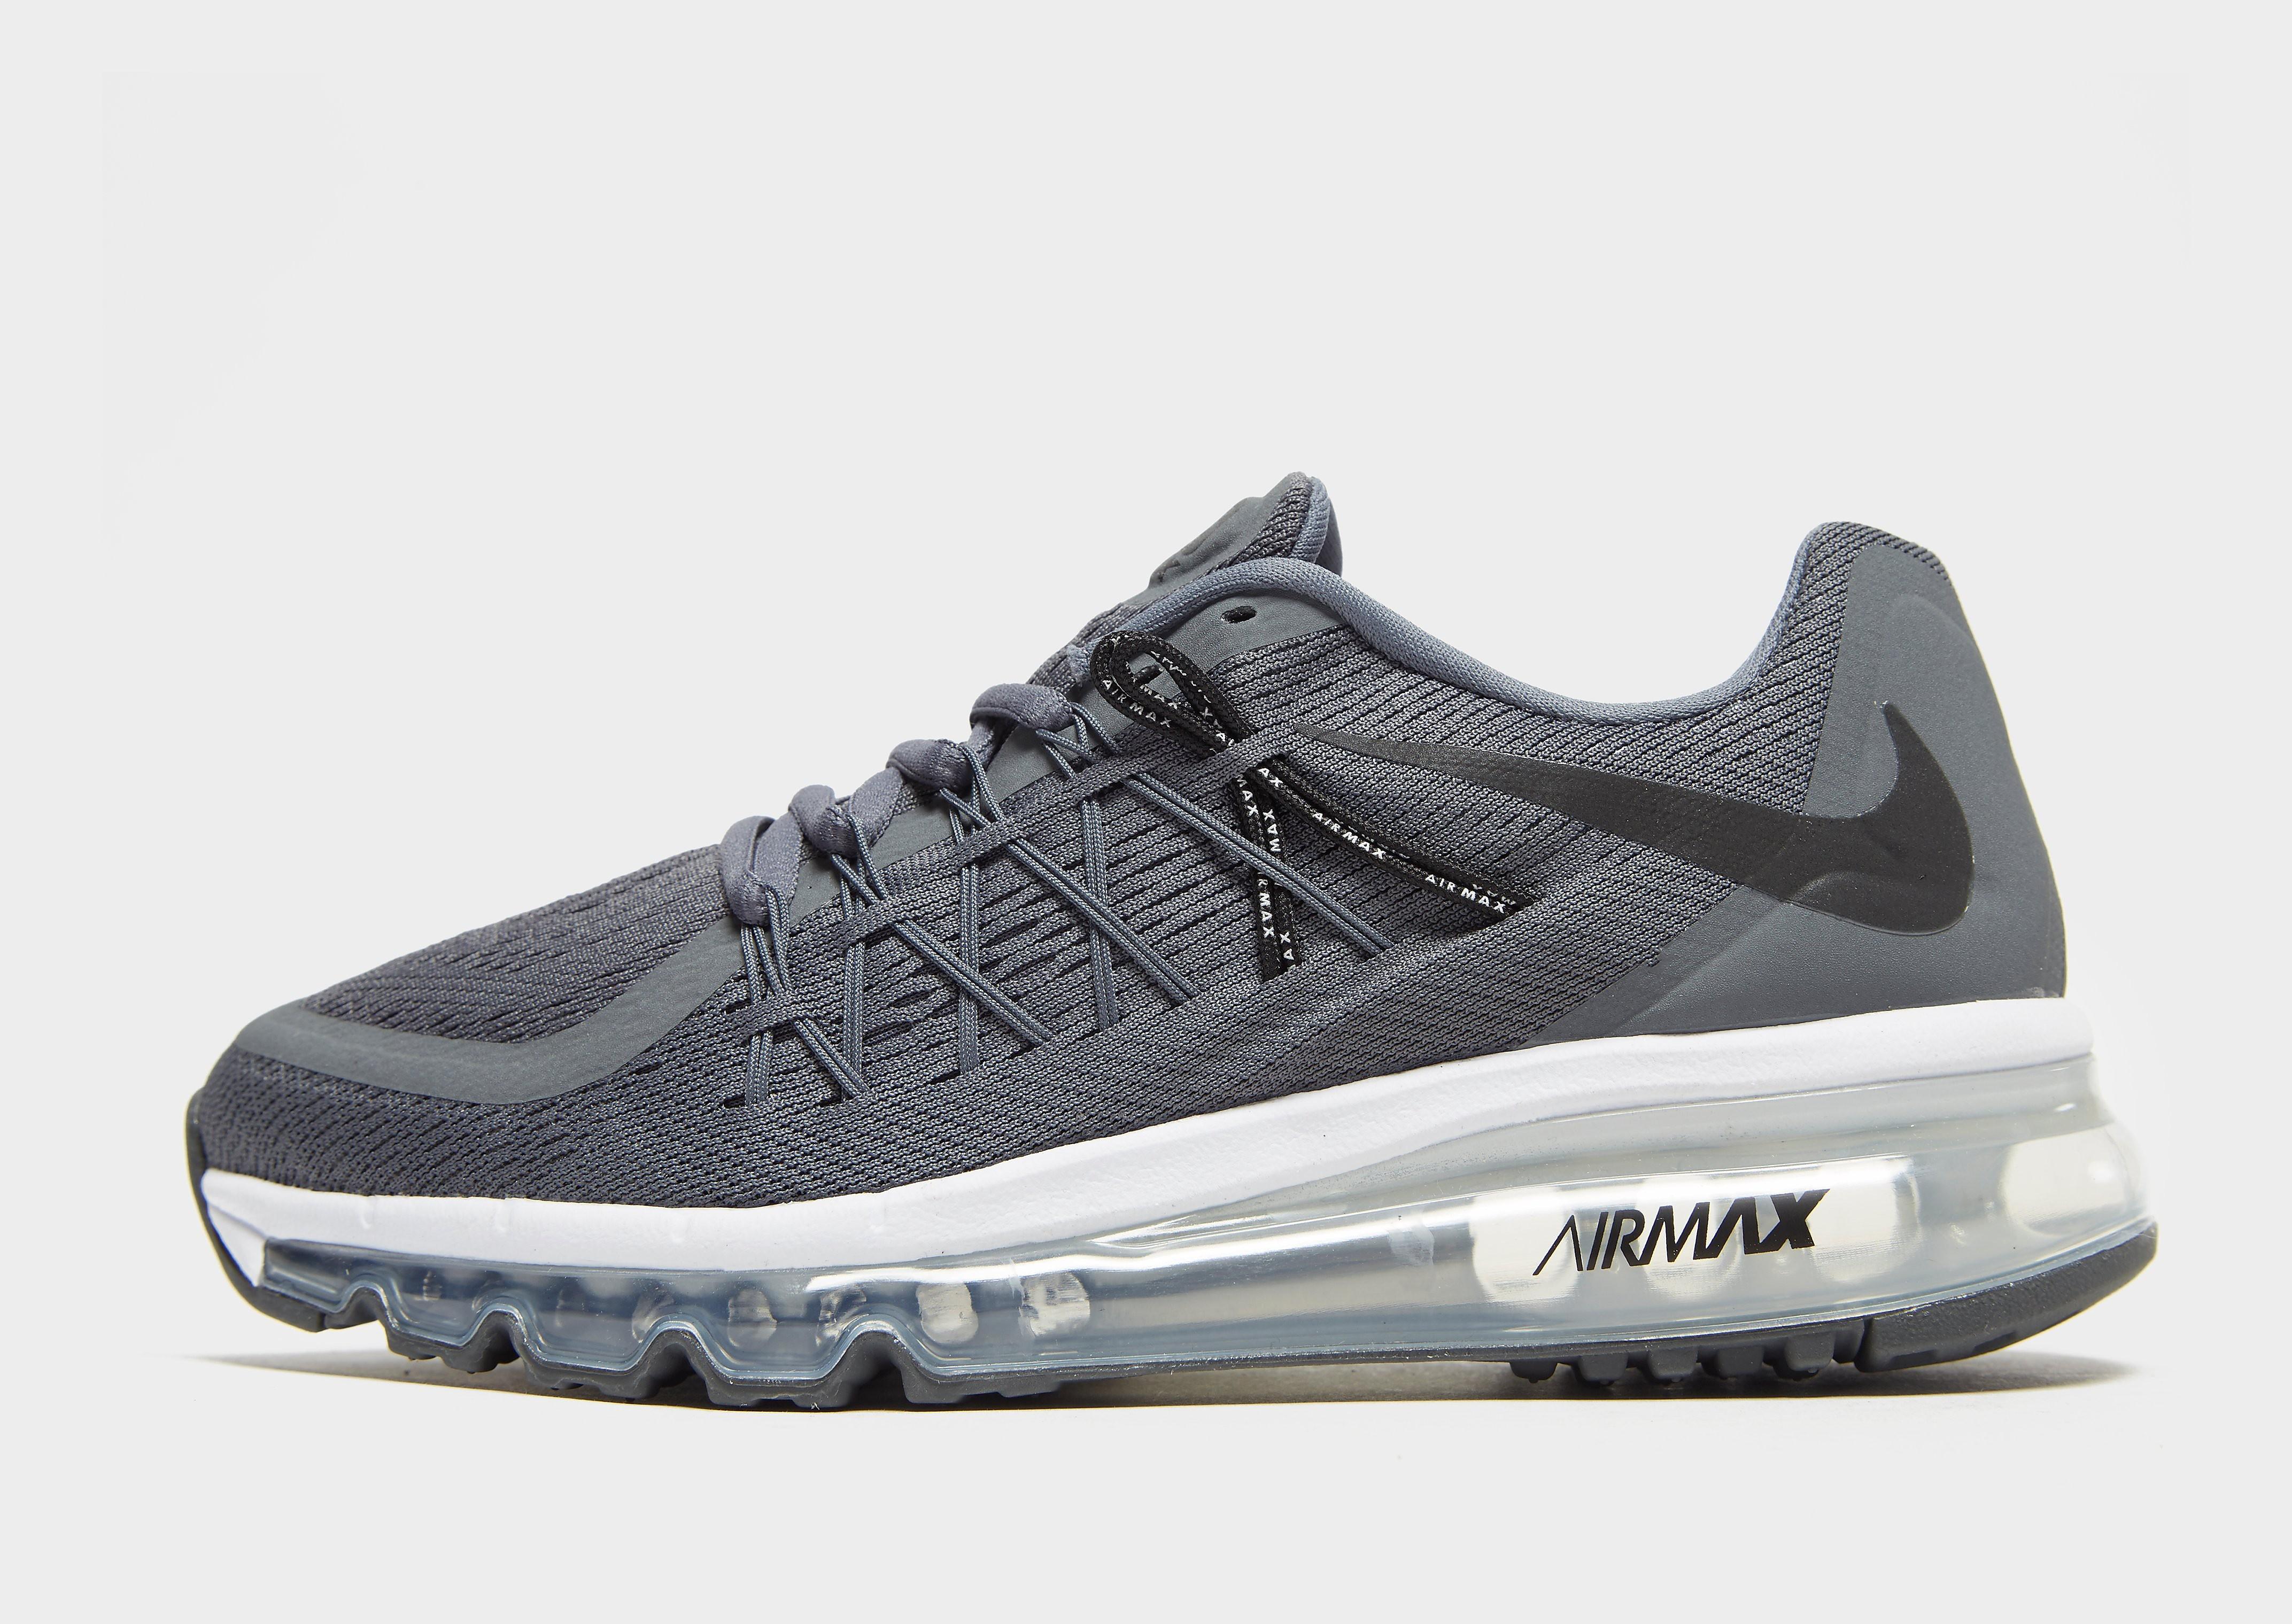 Nike Air Max 2015 kindersneaker grijs